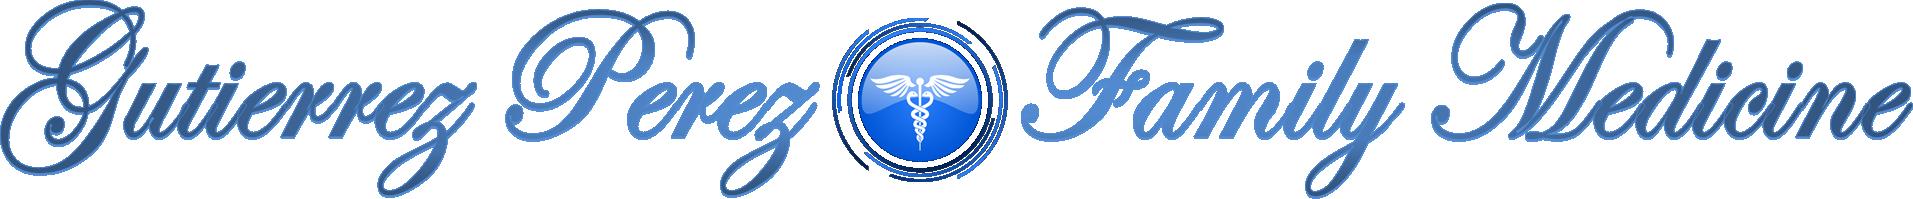 Gutierrez Perez Family Medicine